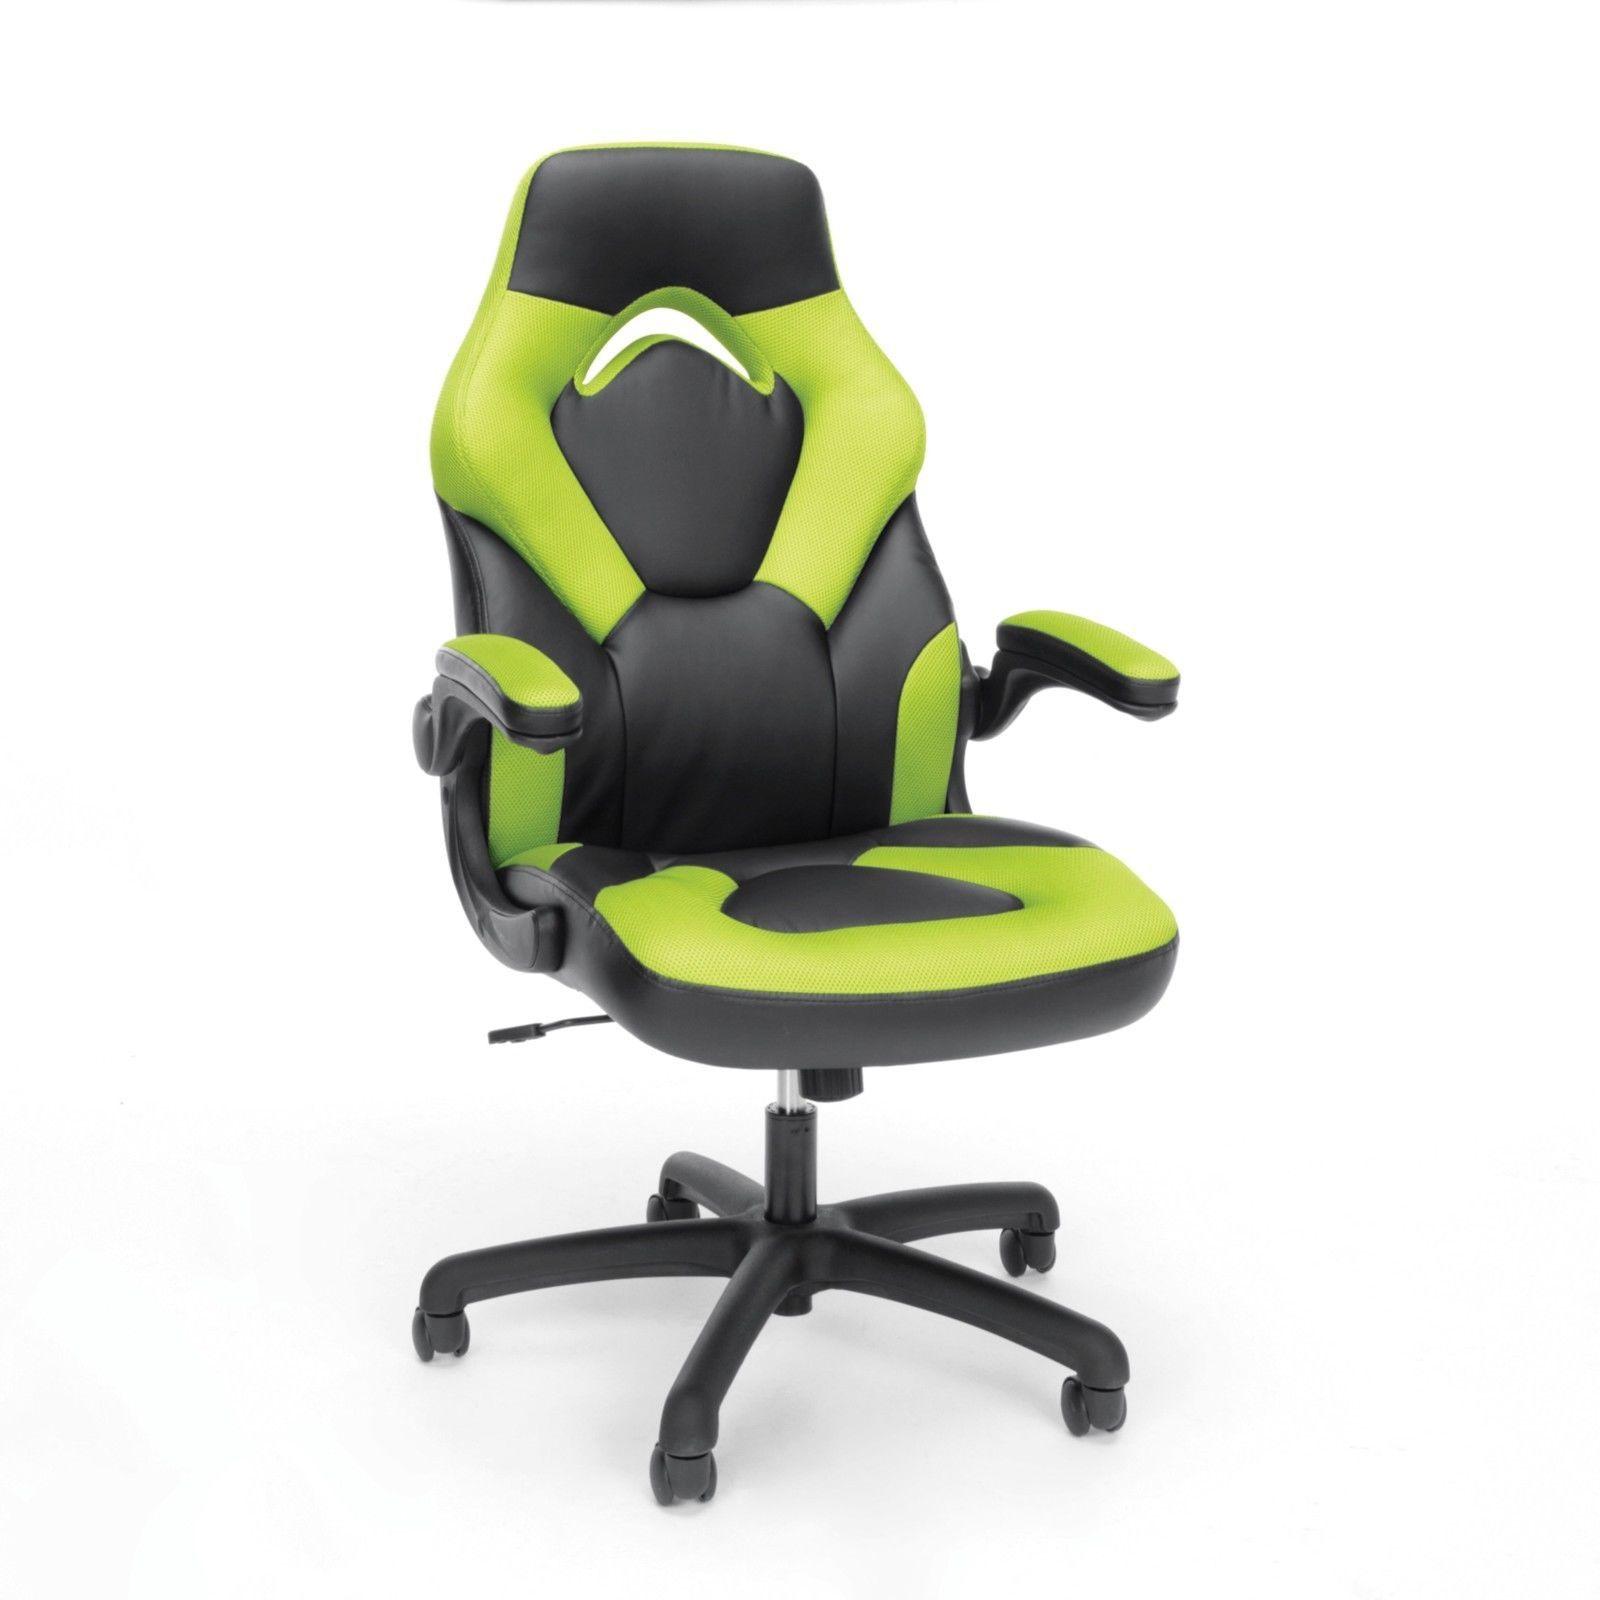 Ergonomic High Back Office Gaming Chair Computer Racing Executive Swivel  Stool